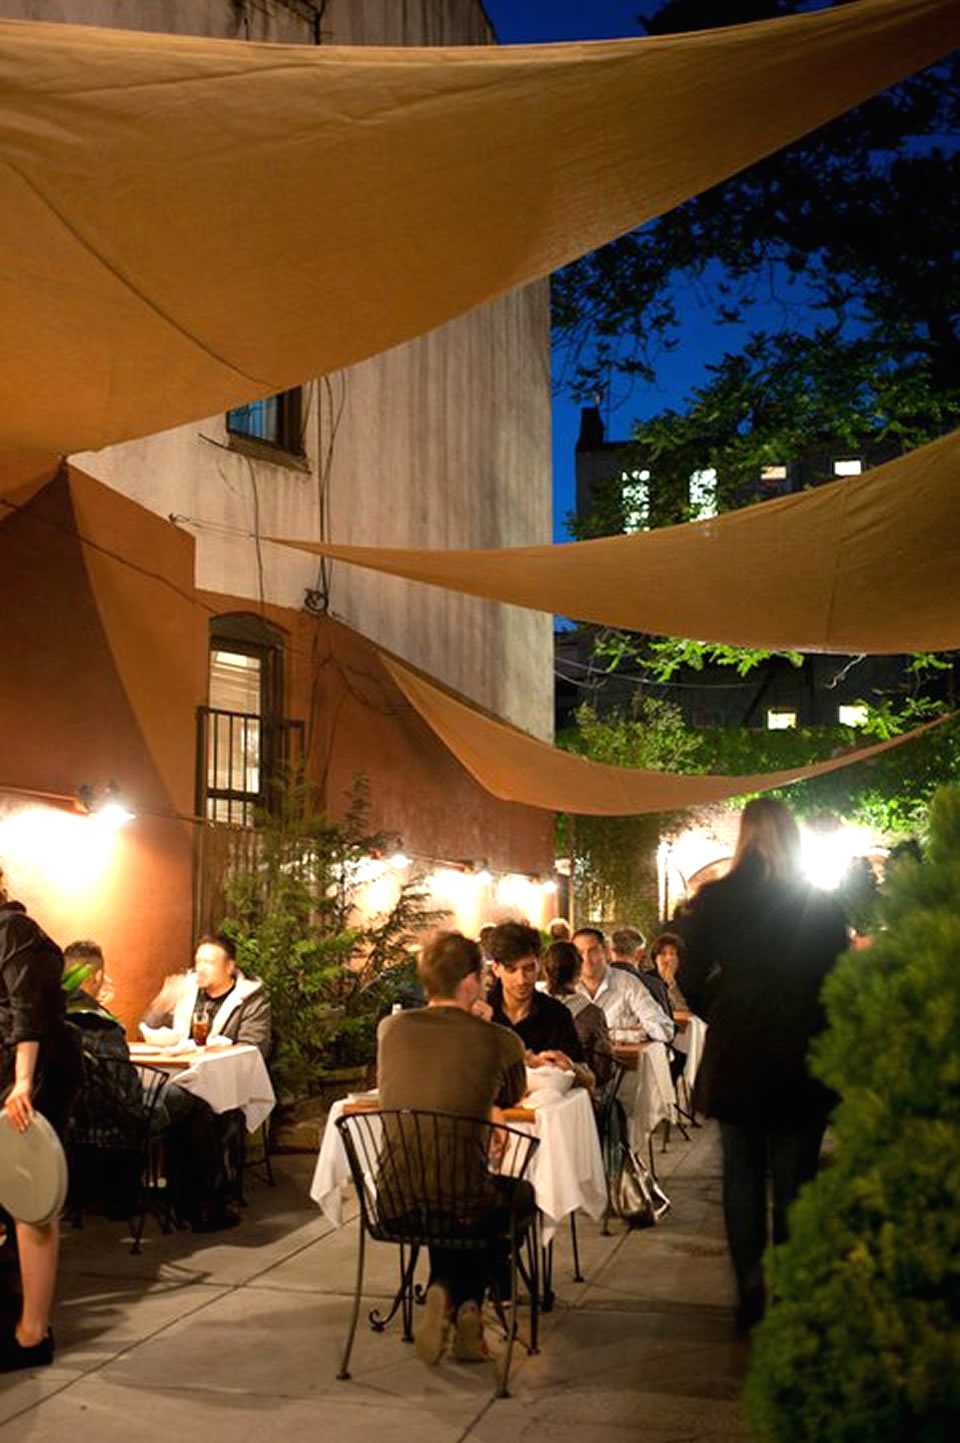 Outdoor-Garden-Patio-Fine-Dining-Hospitality-of-Benchmark-Restaurant-Brooklyn.jpg